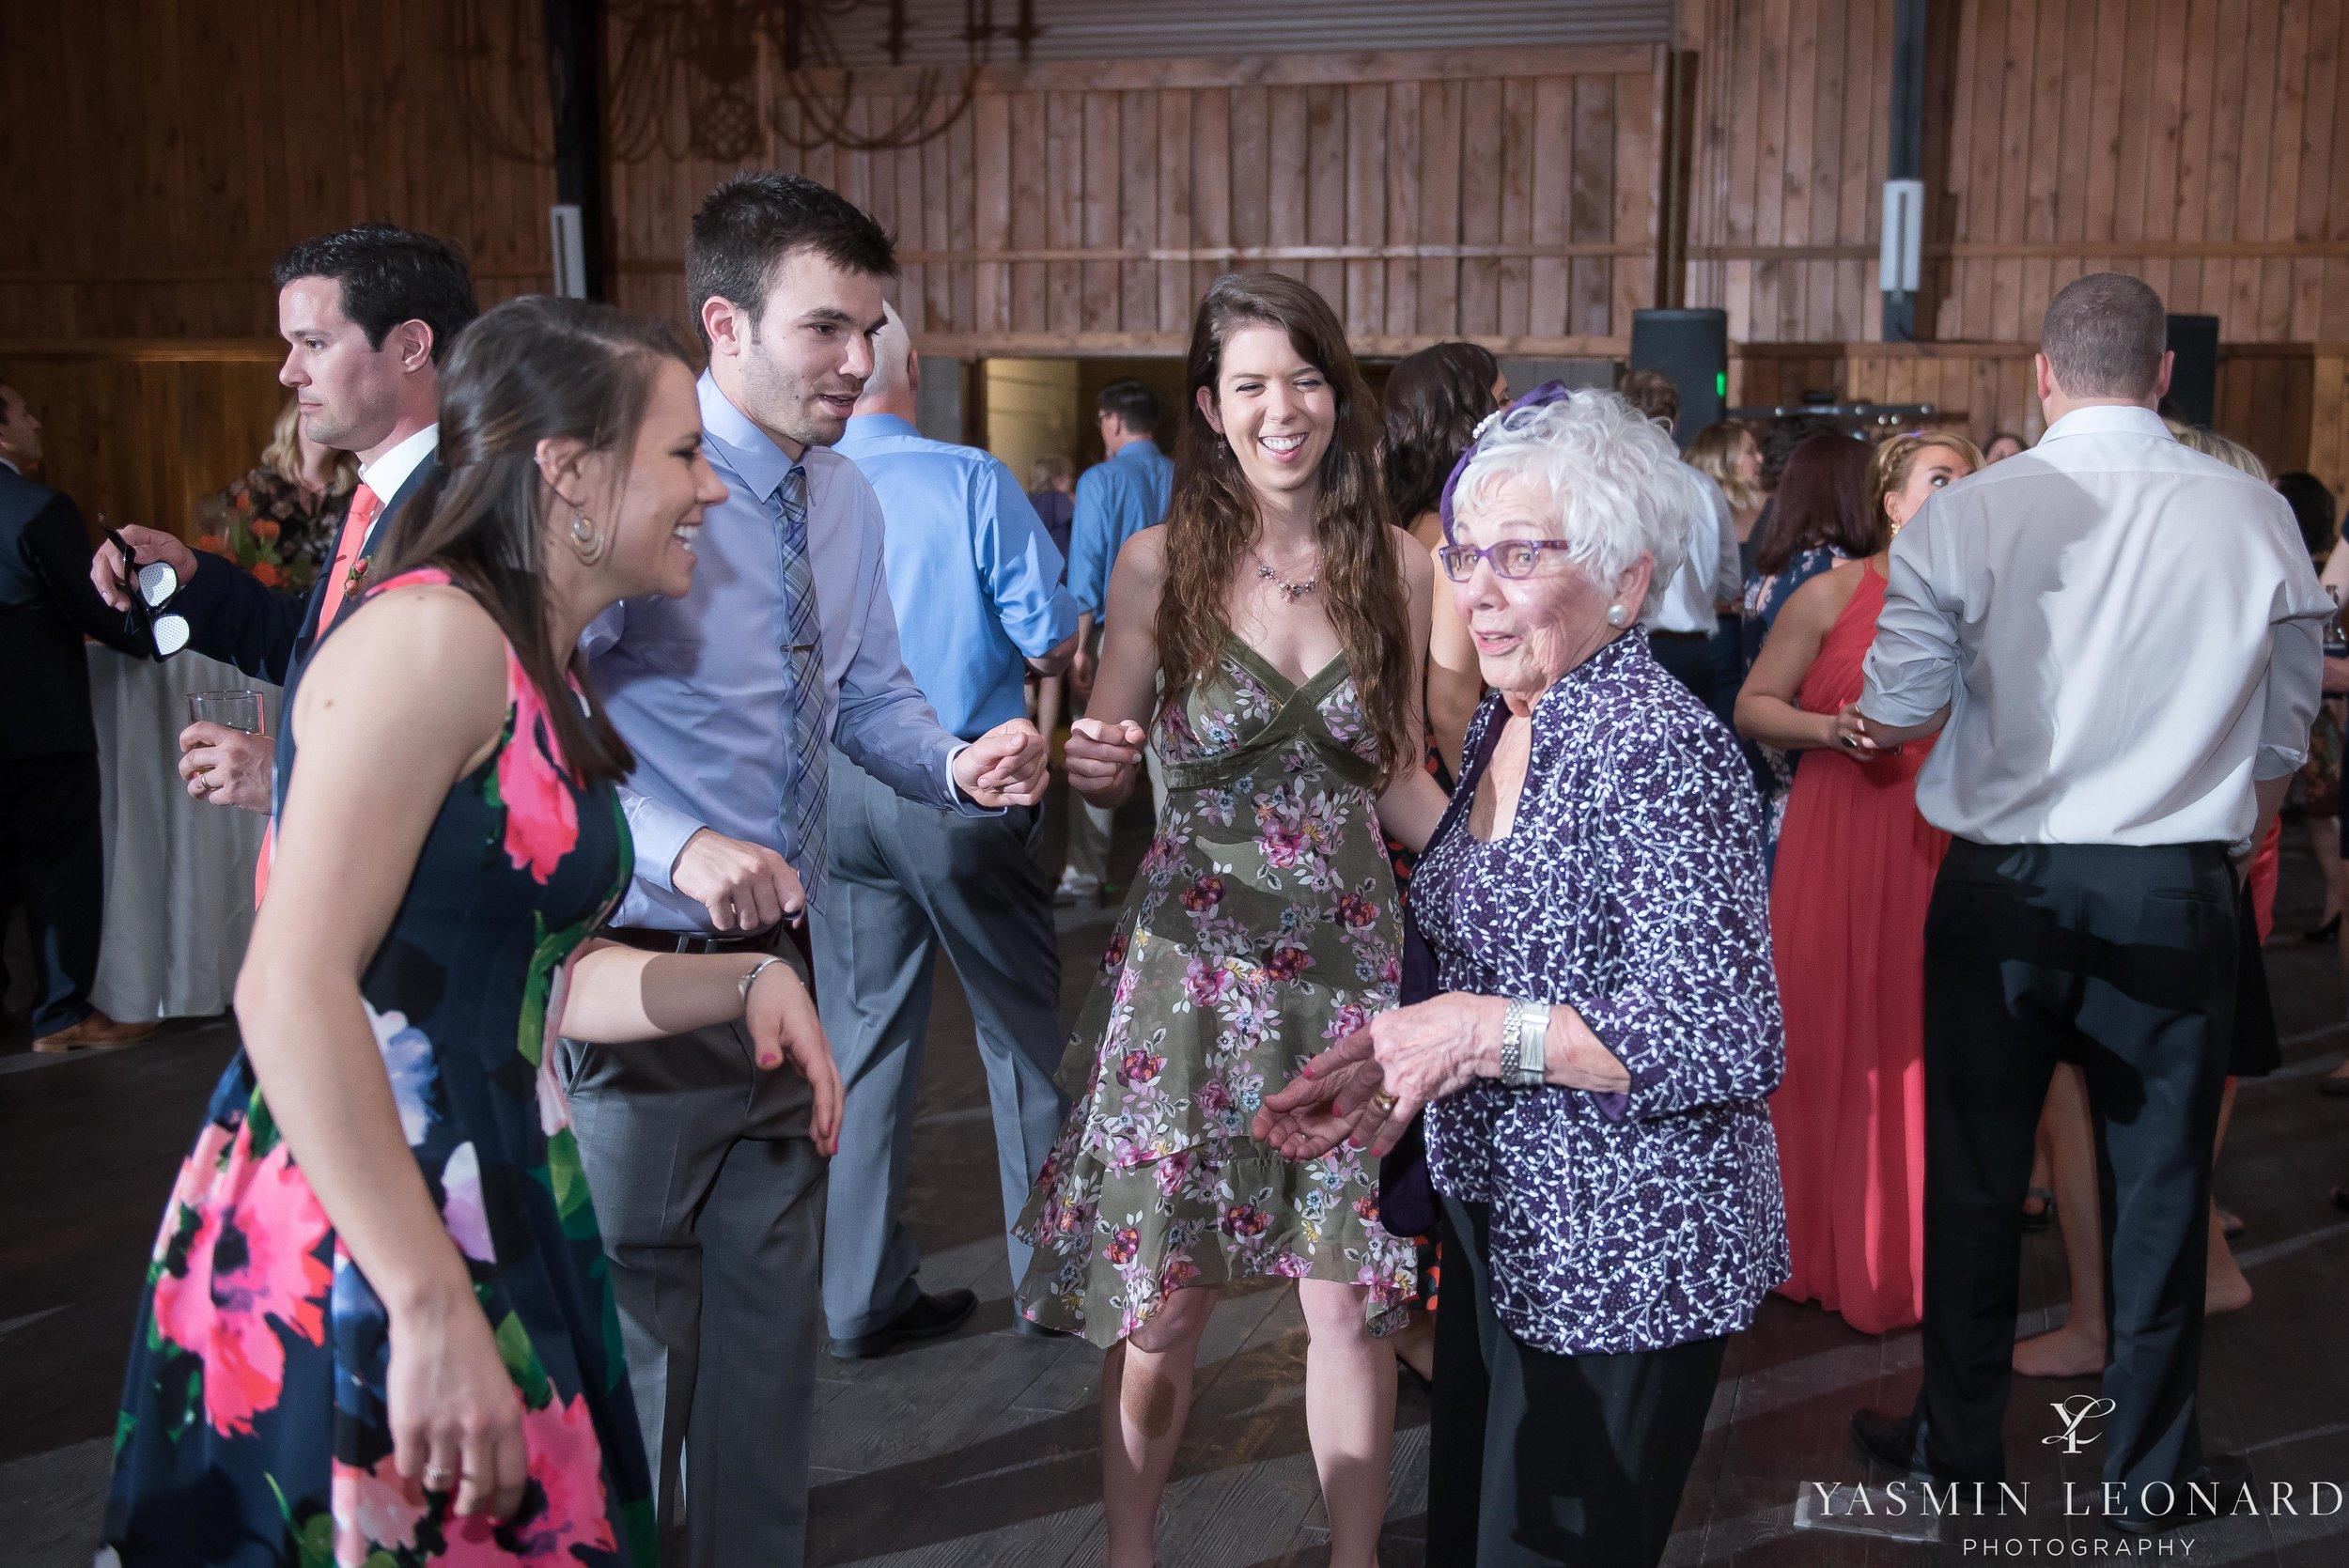 Adaumont Farm - Adaumont Farm Weddings - Trinity Weddings - NC Weddings - Yasmin Leonard Photography-87.jpg